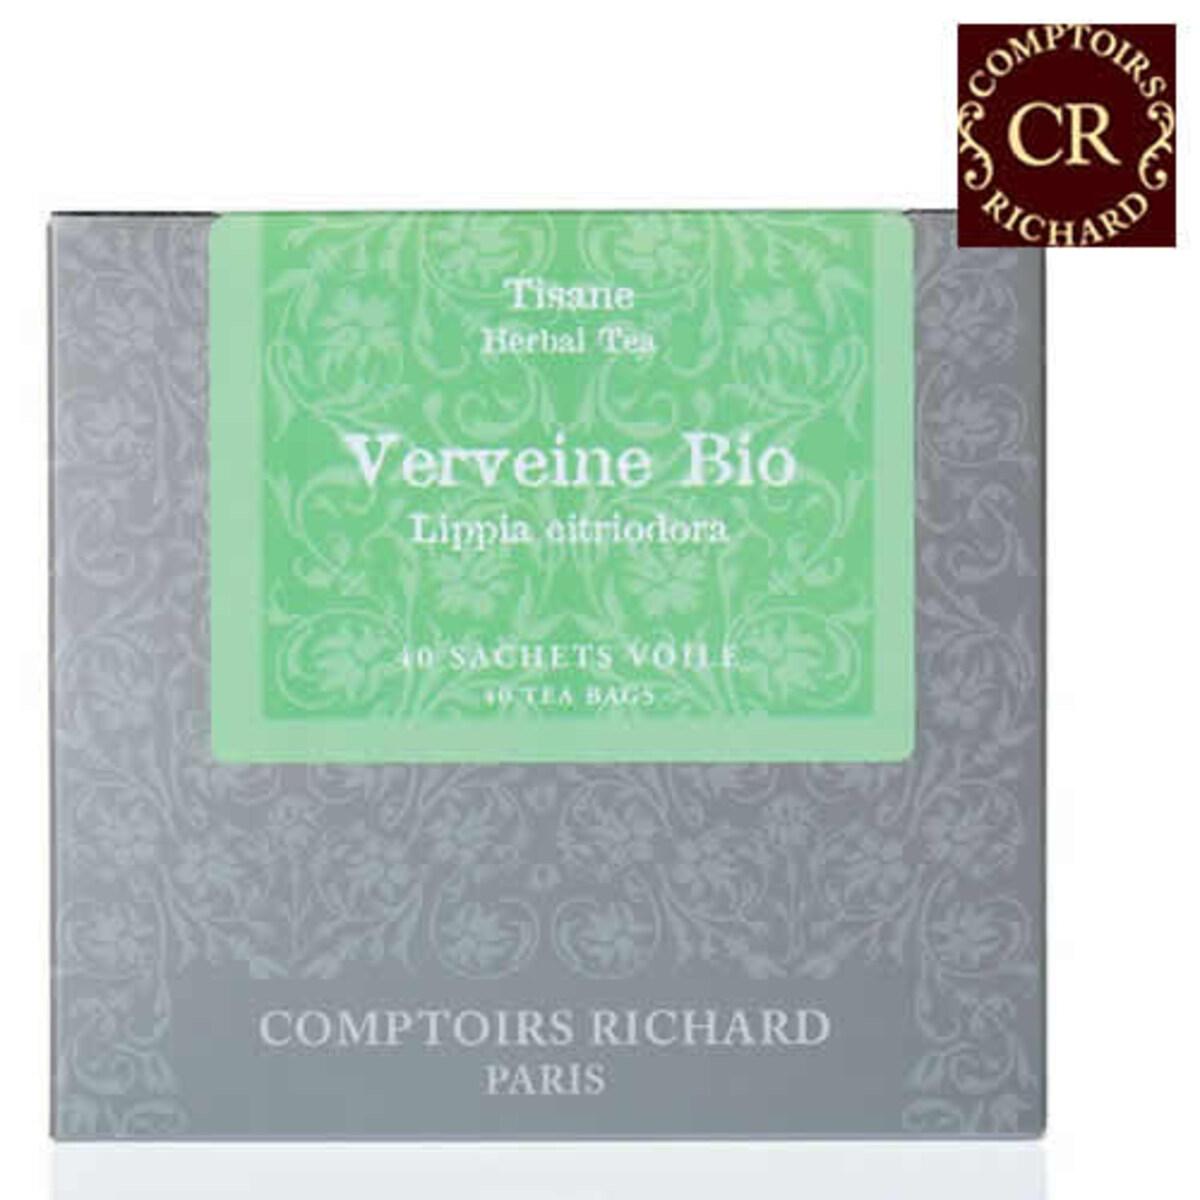 Comptoirs Richard Verveine Bio - 40бр сашета билков чай био Върбинка